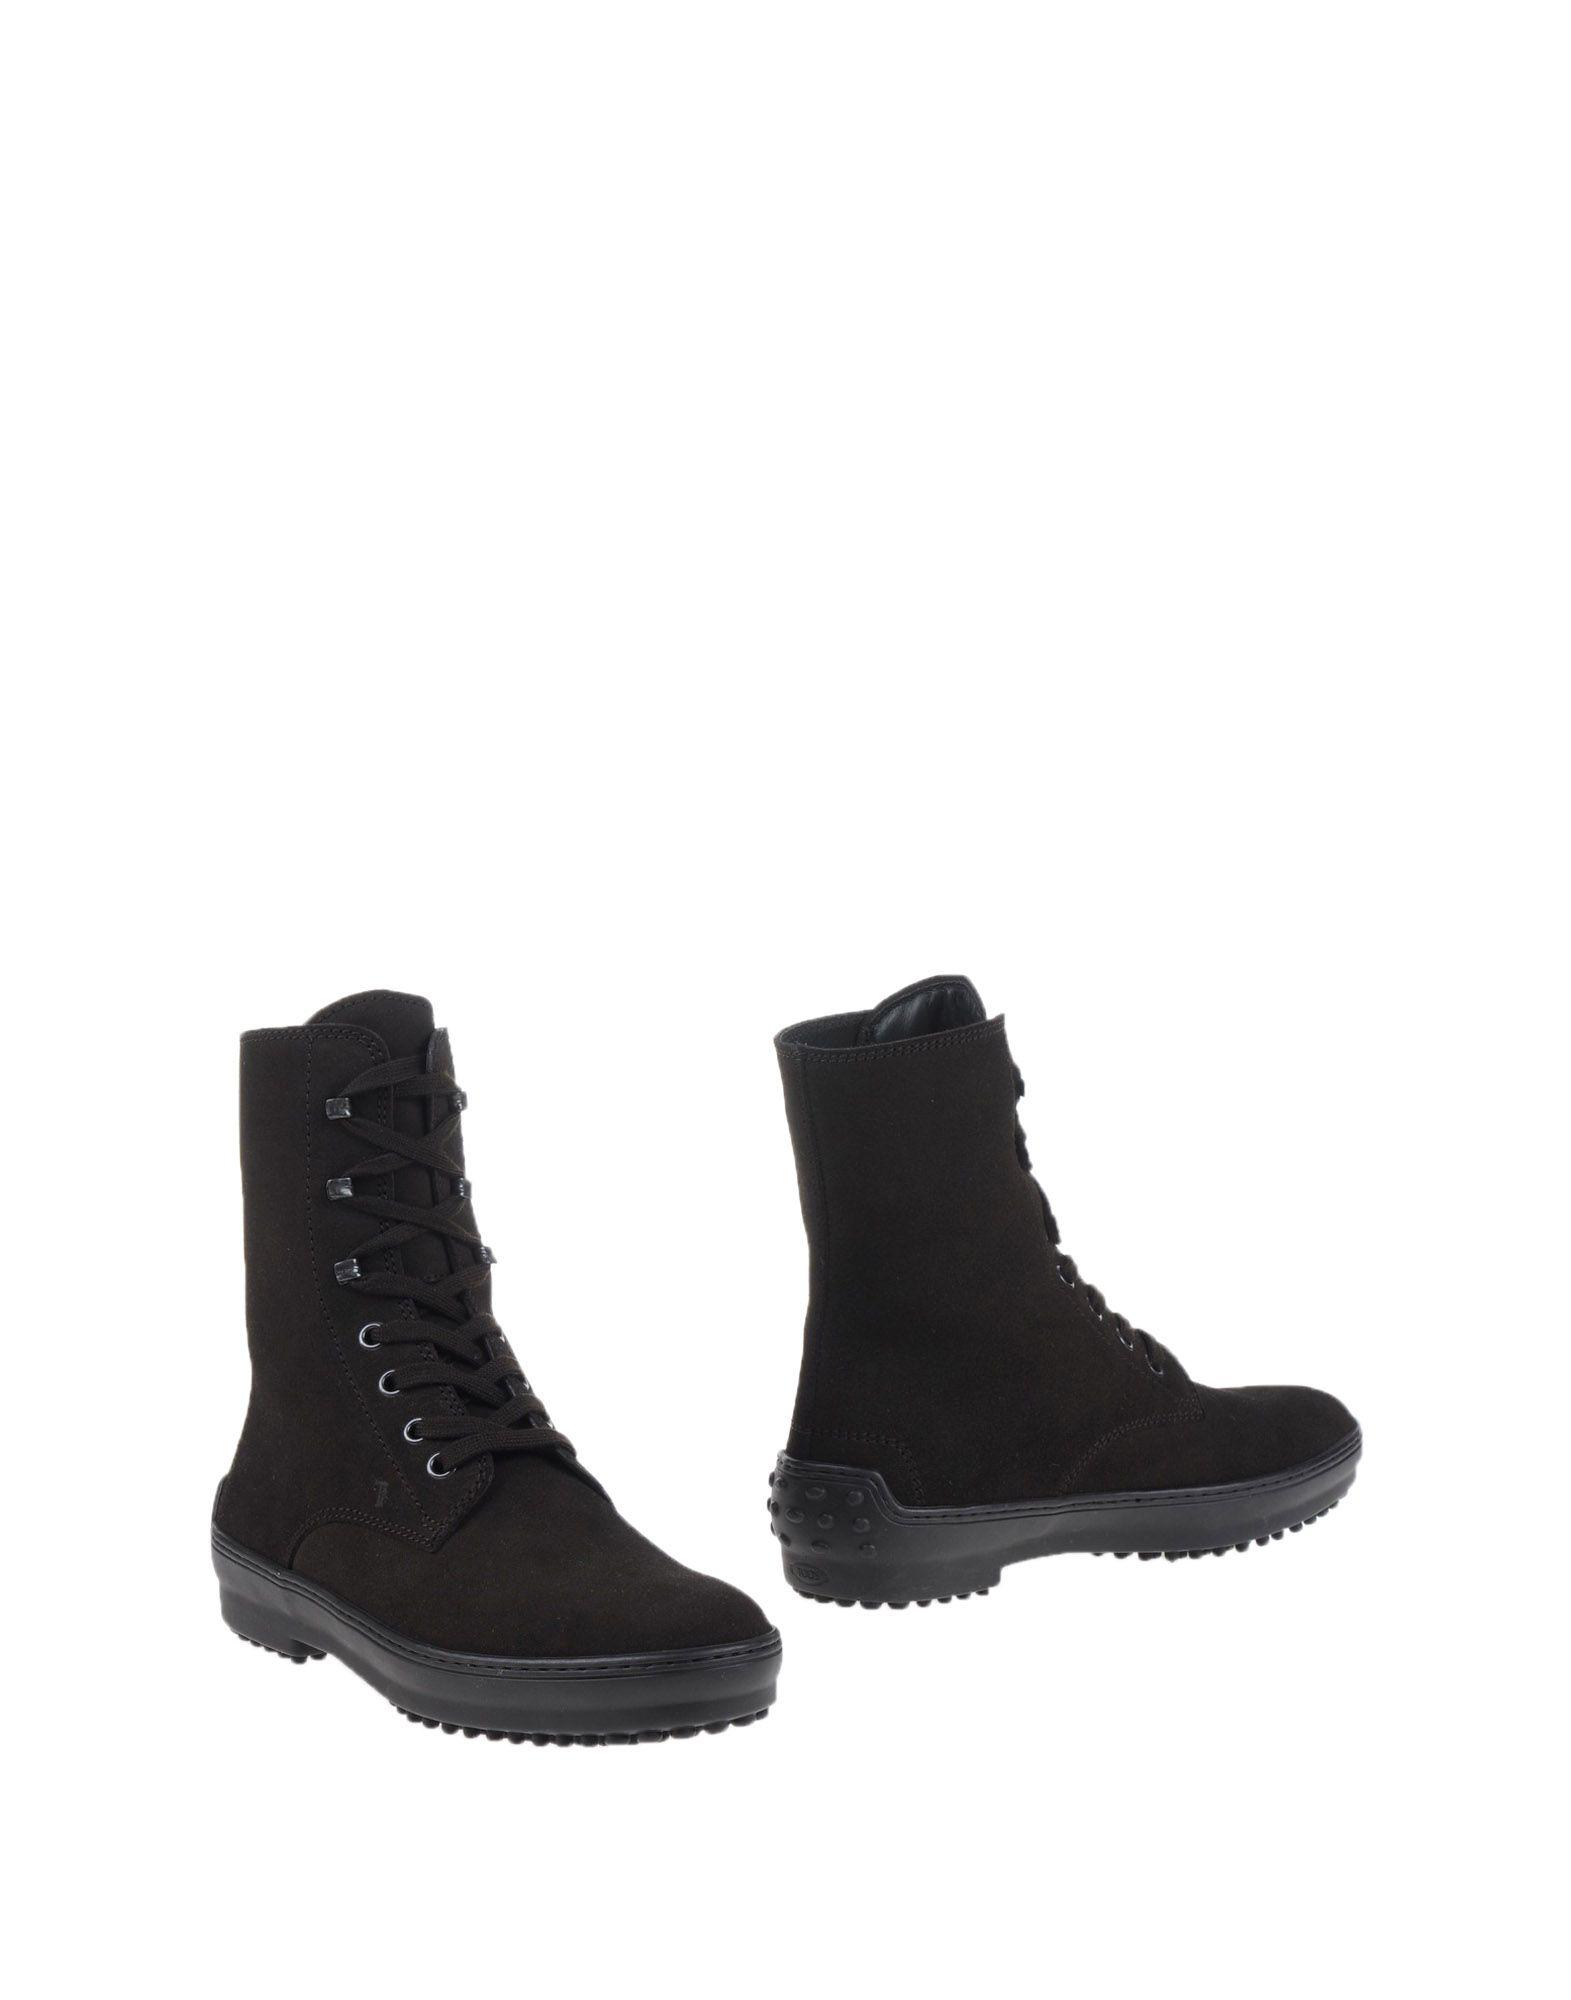 Rabatt Rabatt Rabatt Schuhe Tod's Stiefelette Damen  11011019AG b44efc